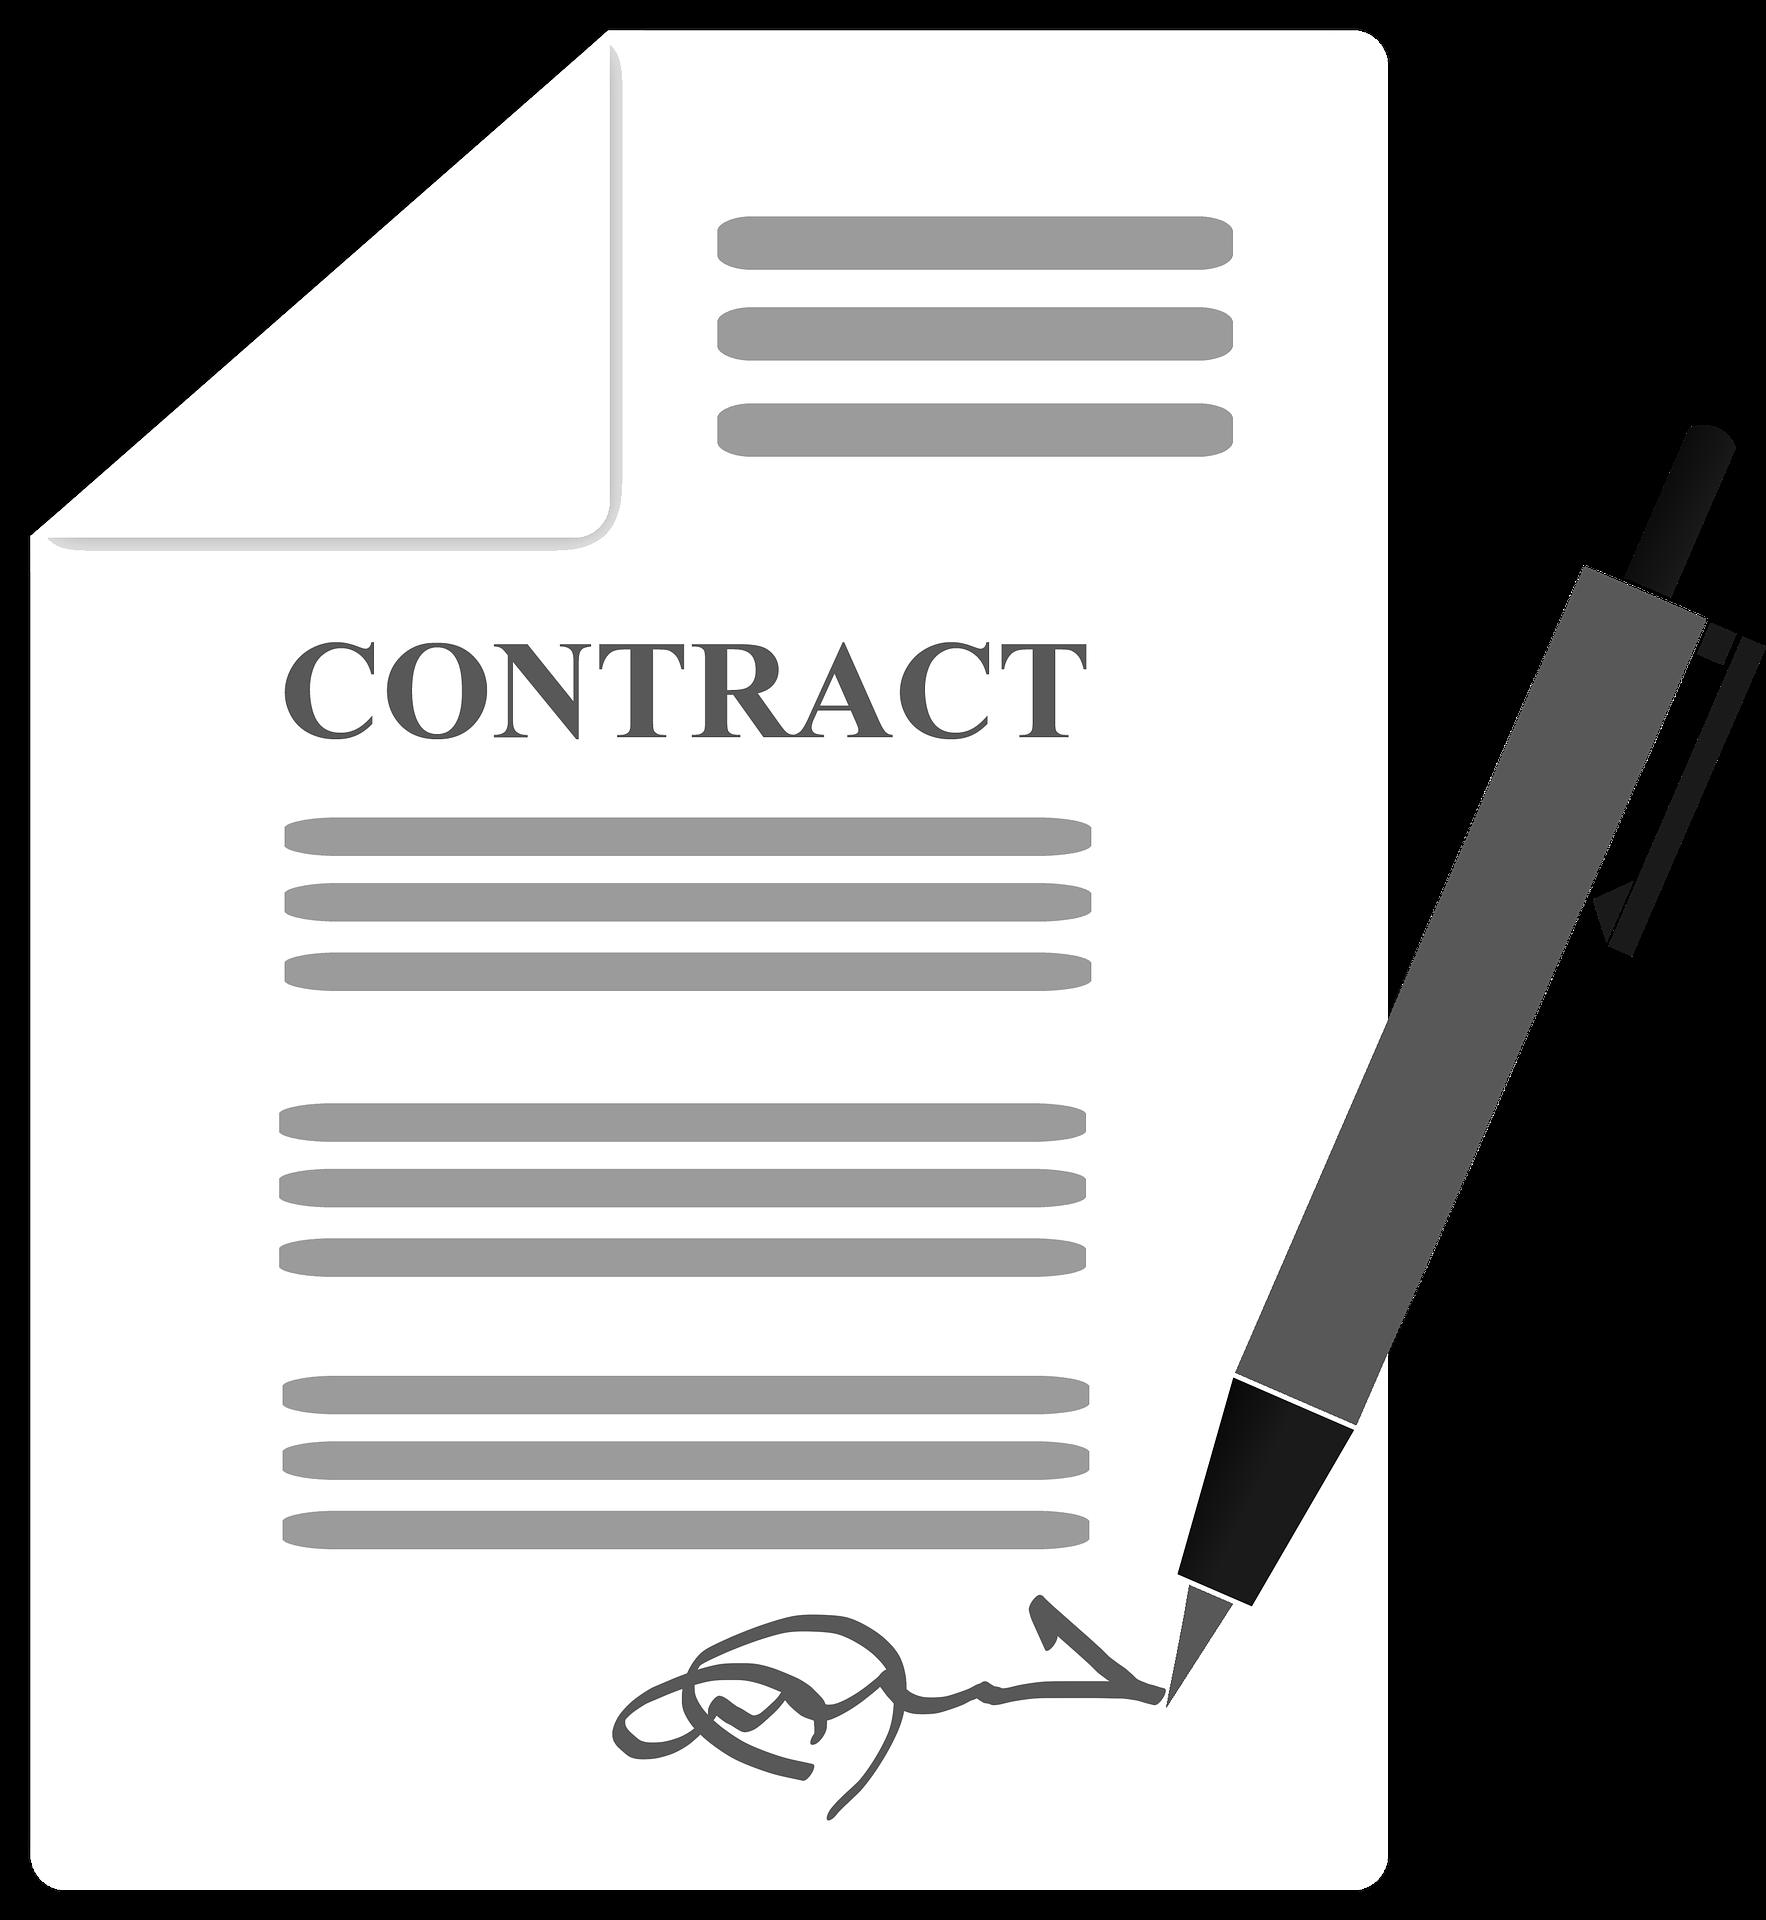 Prise de garantie hypothèque huissier caution saisie gage